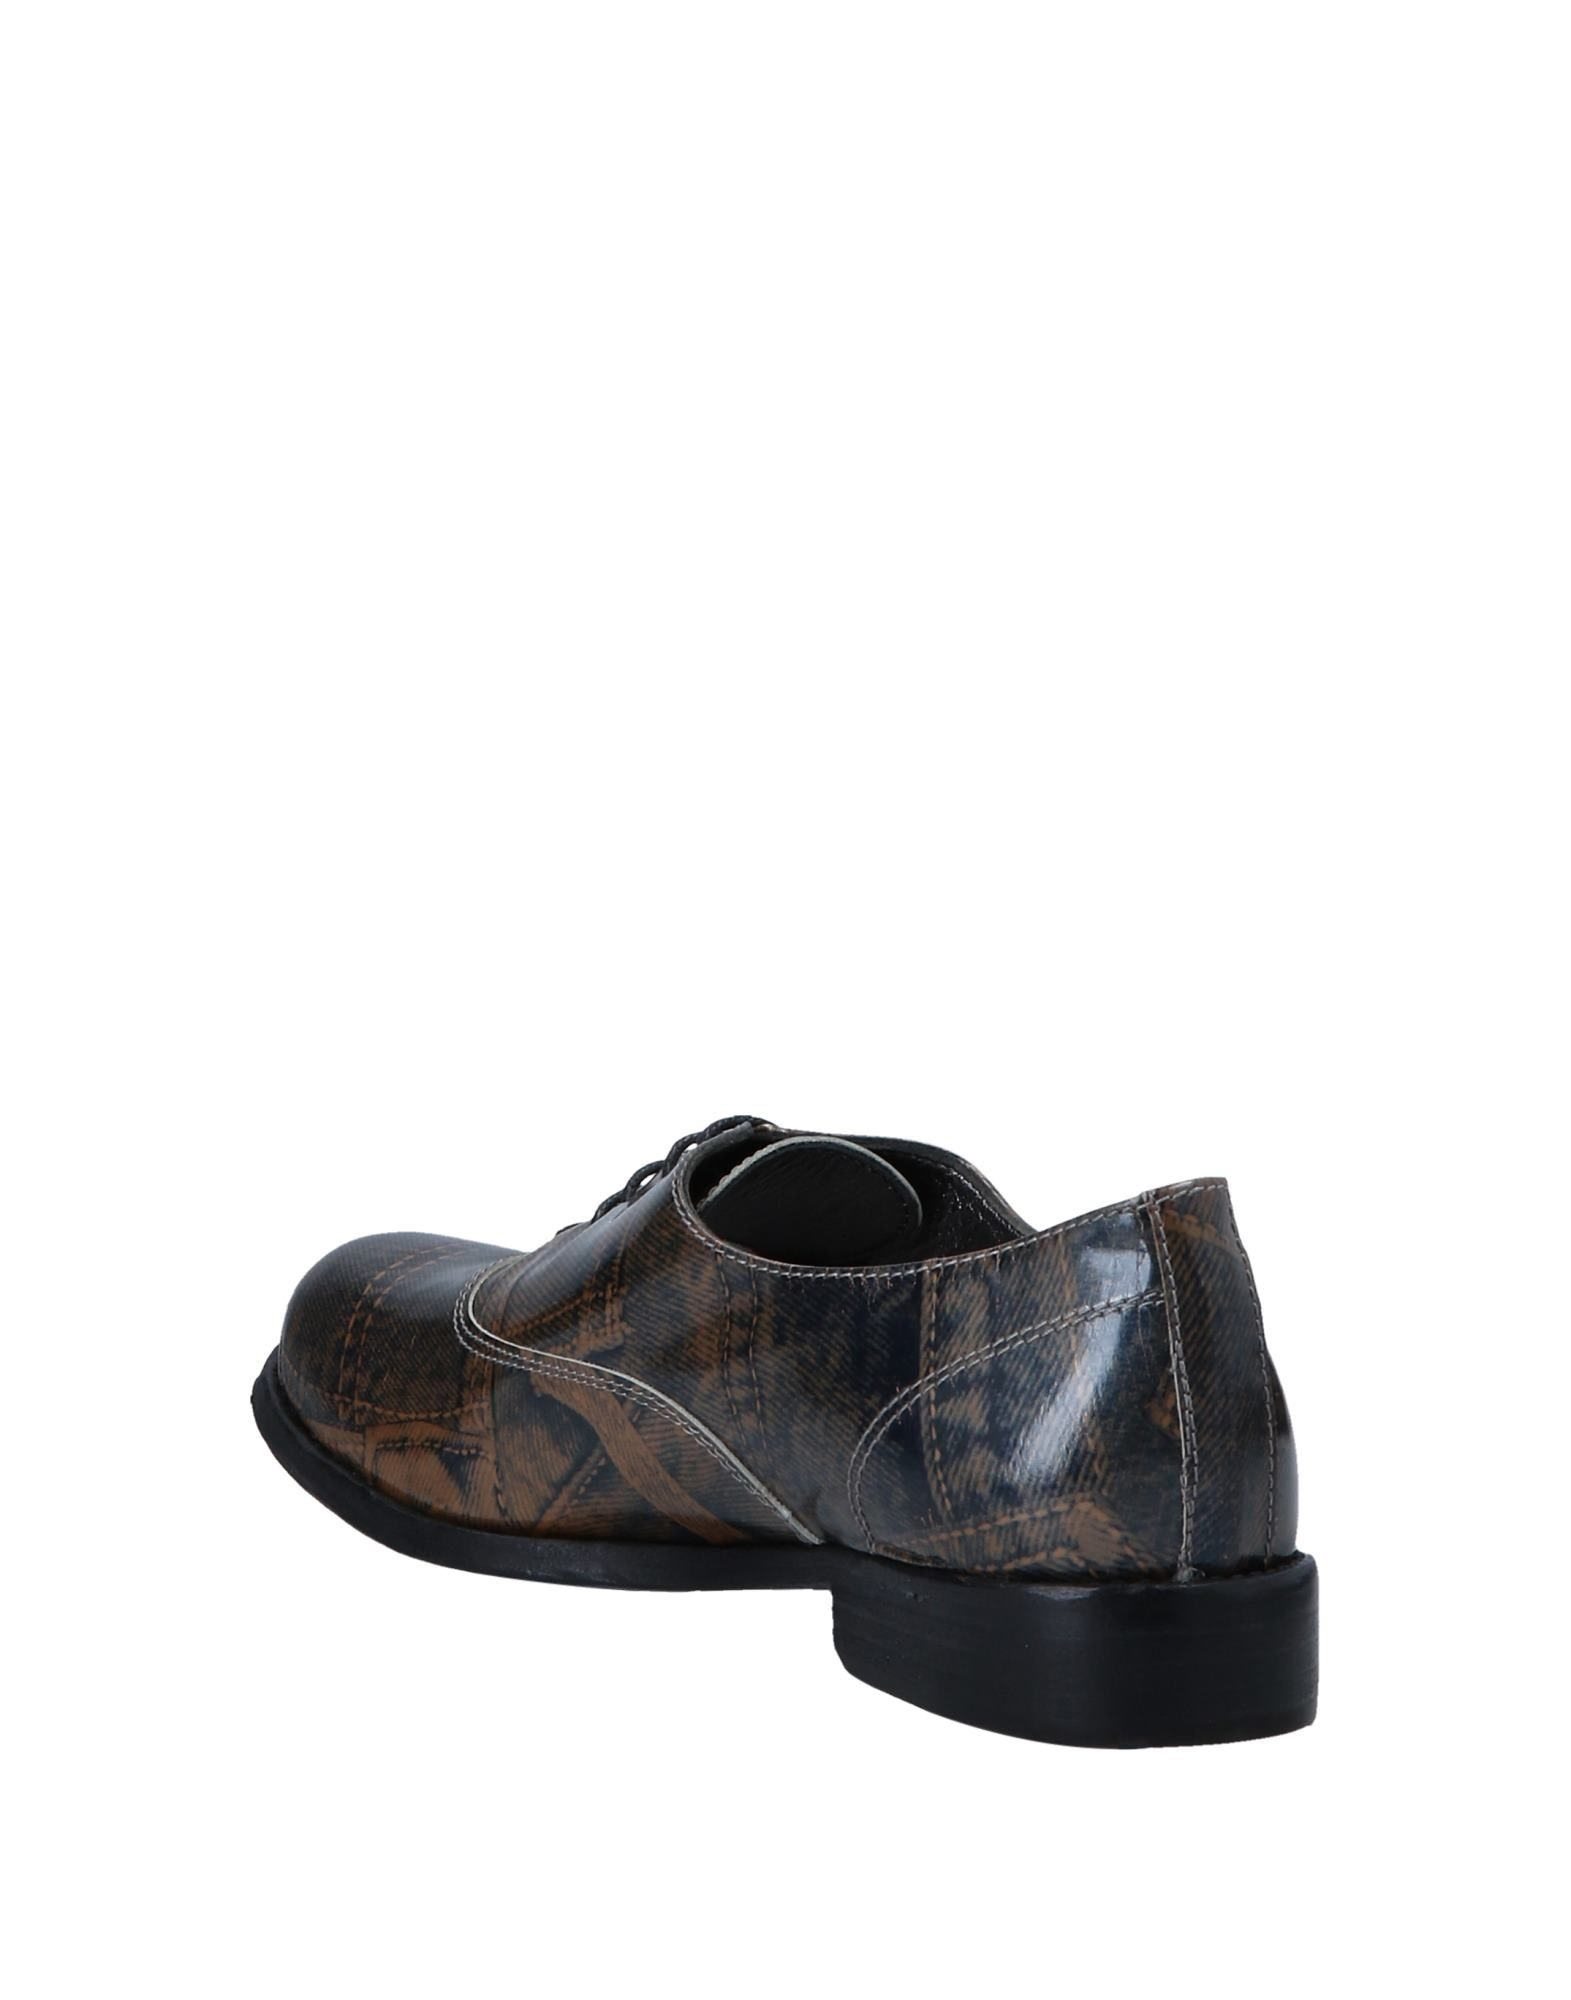 Angel Schnürschuhe Damen  11546599XK Gute Qualität beliebte Schuhe